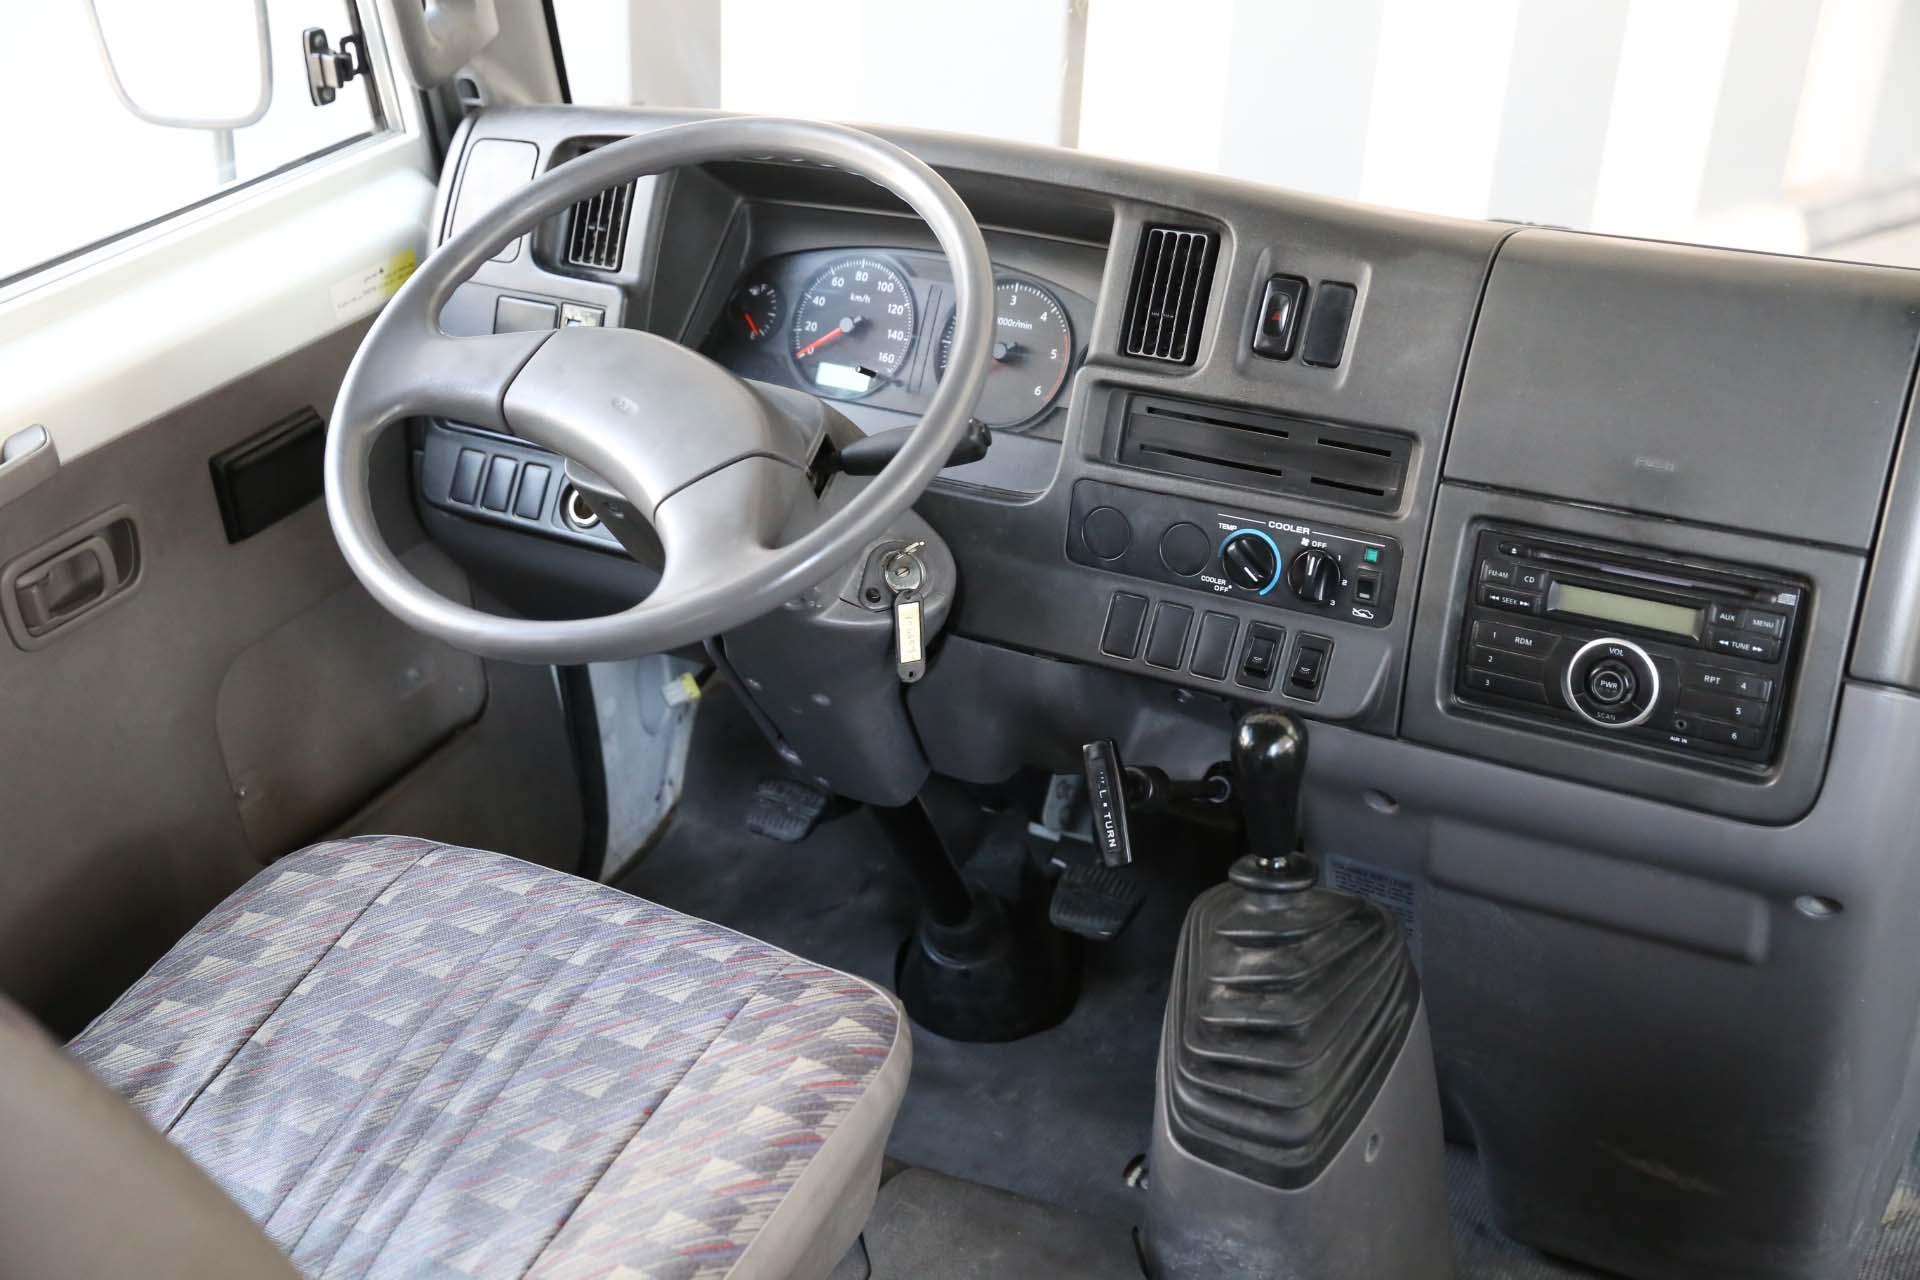 Nissan Civilian 2016 30 Seats